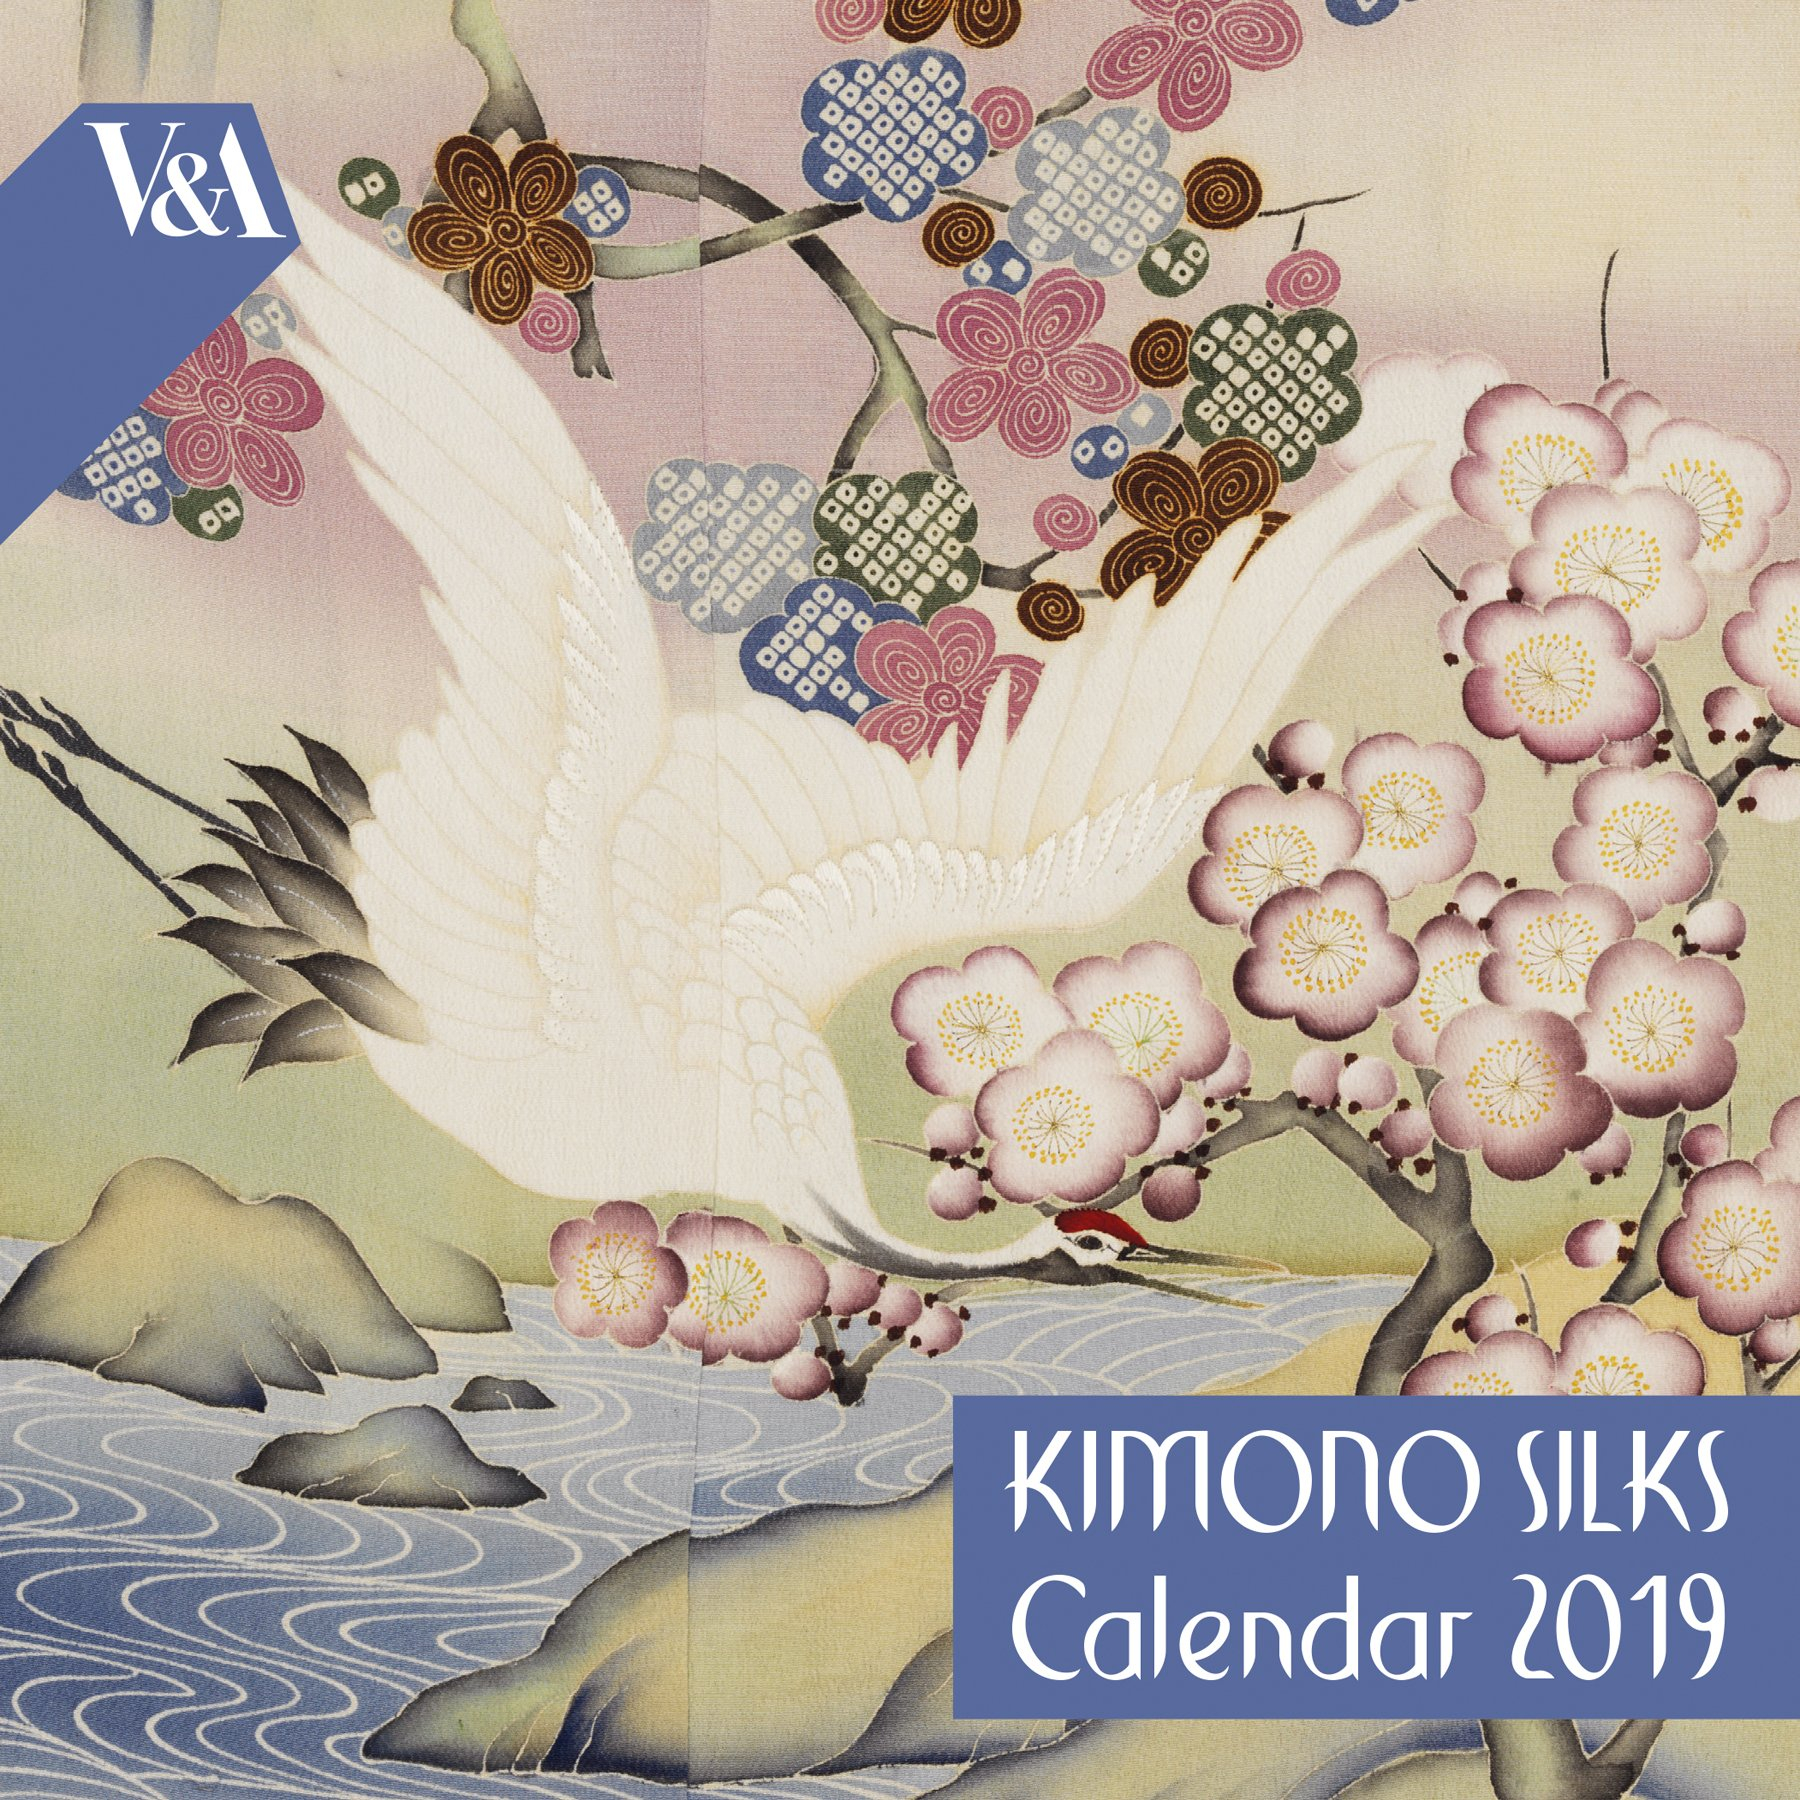 Buy V&a Kimono Silks – Mini Wall Calendar 2019 (Art Calendar) V&a Calendar 2019